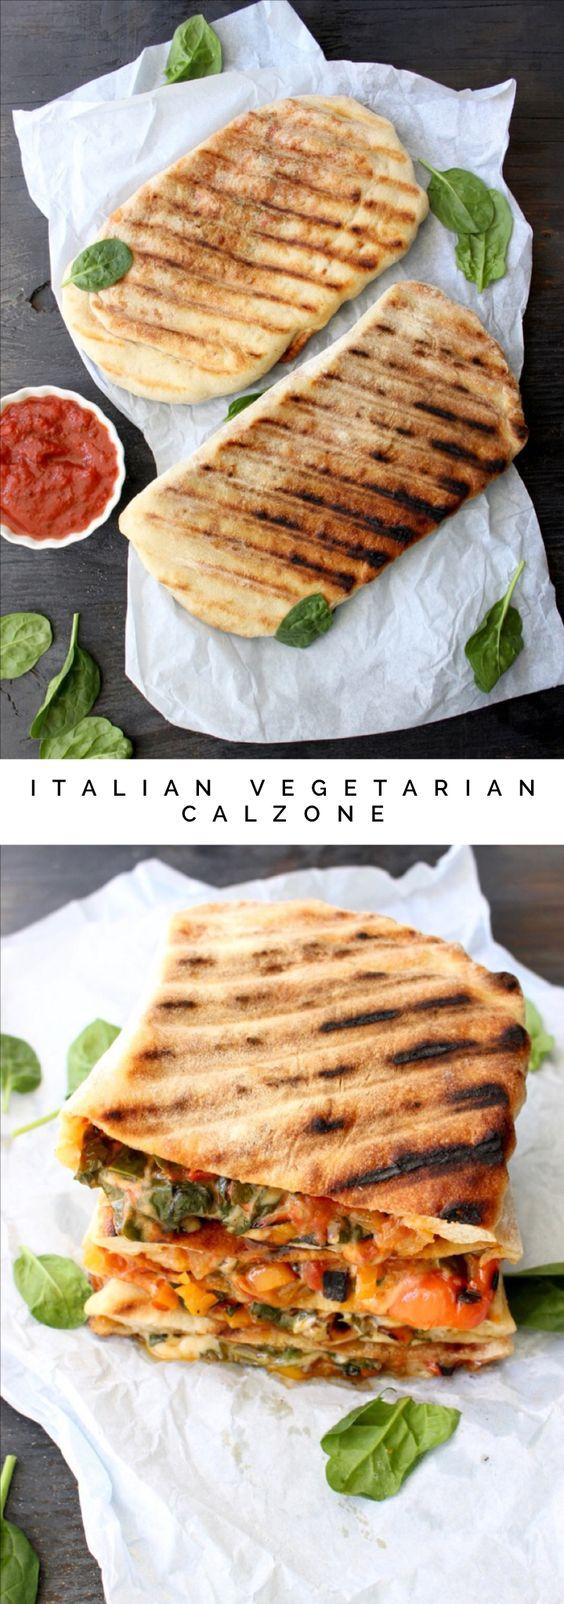 Italian Vegetarian Calzone Recipe   CiaoFlorentina.com